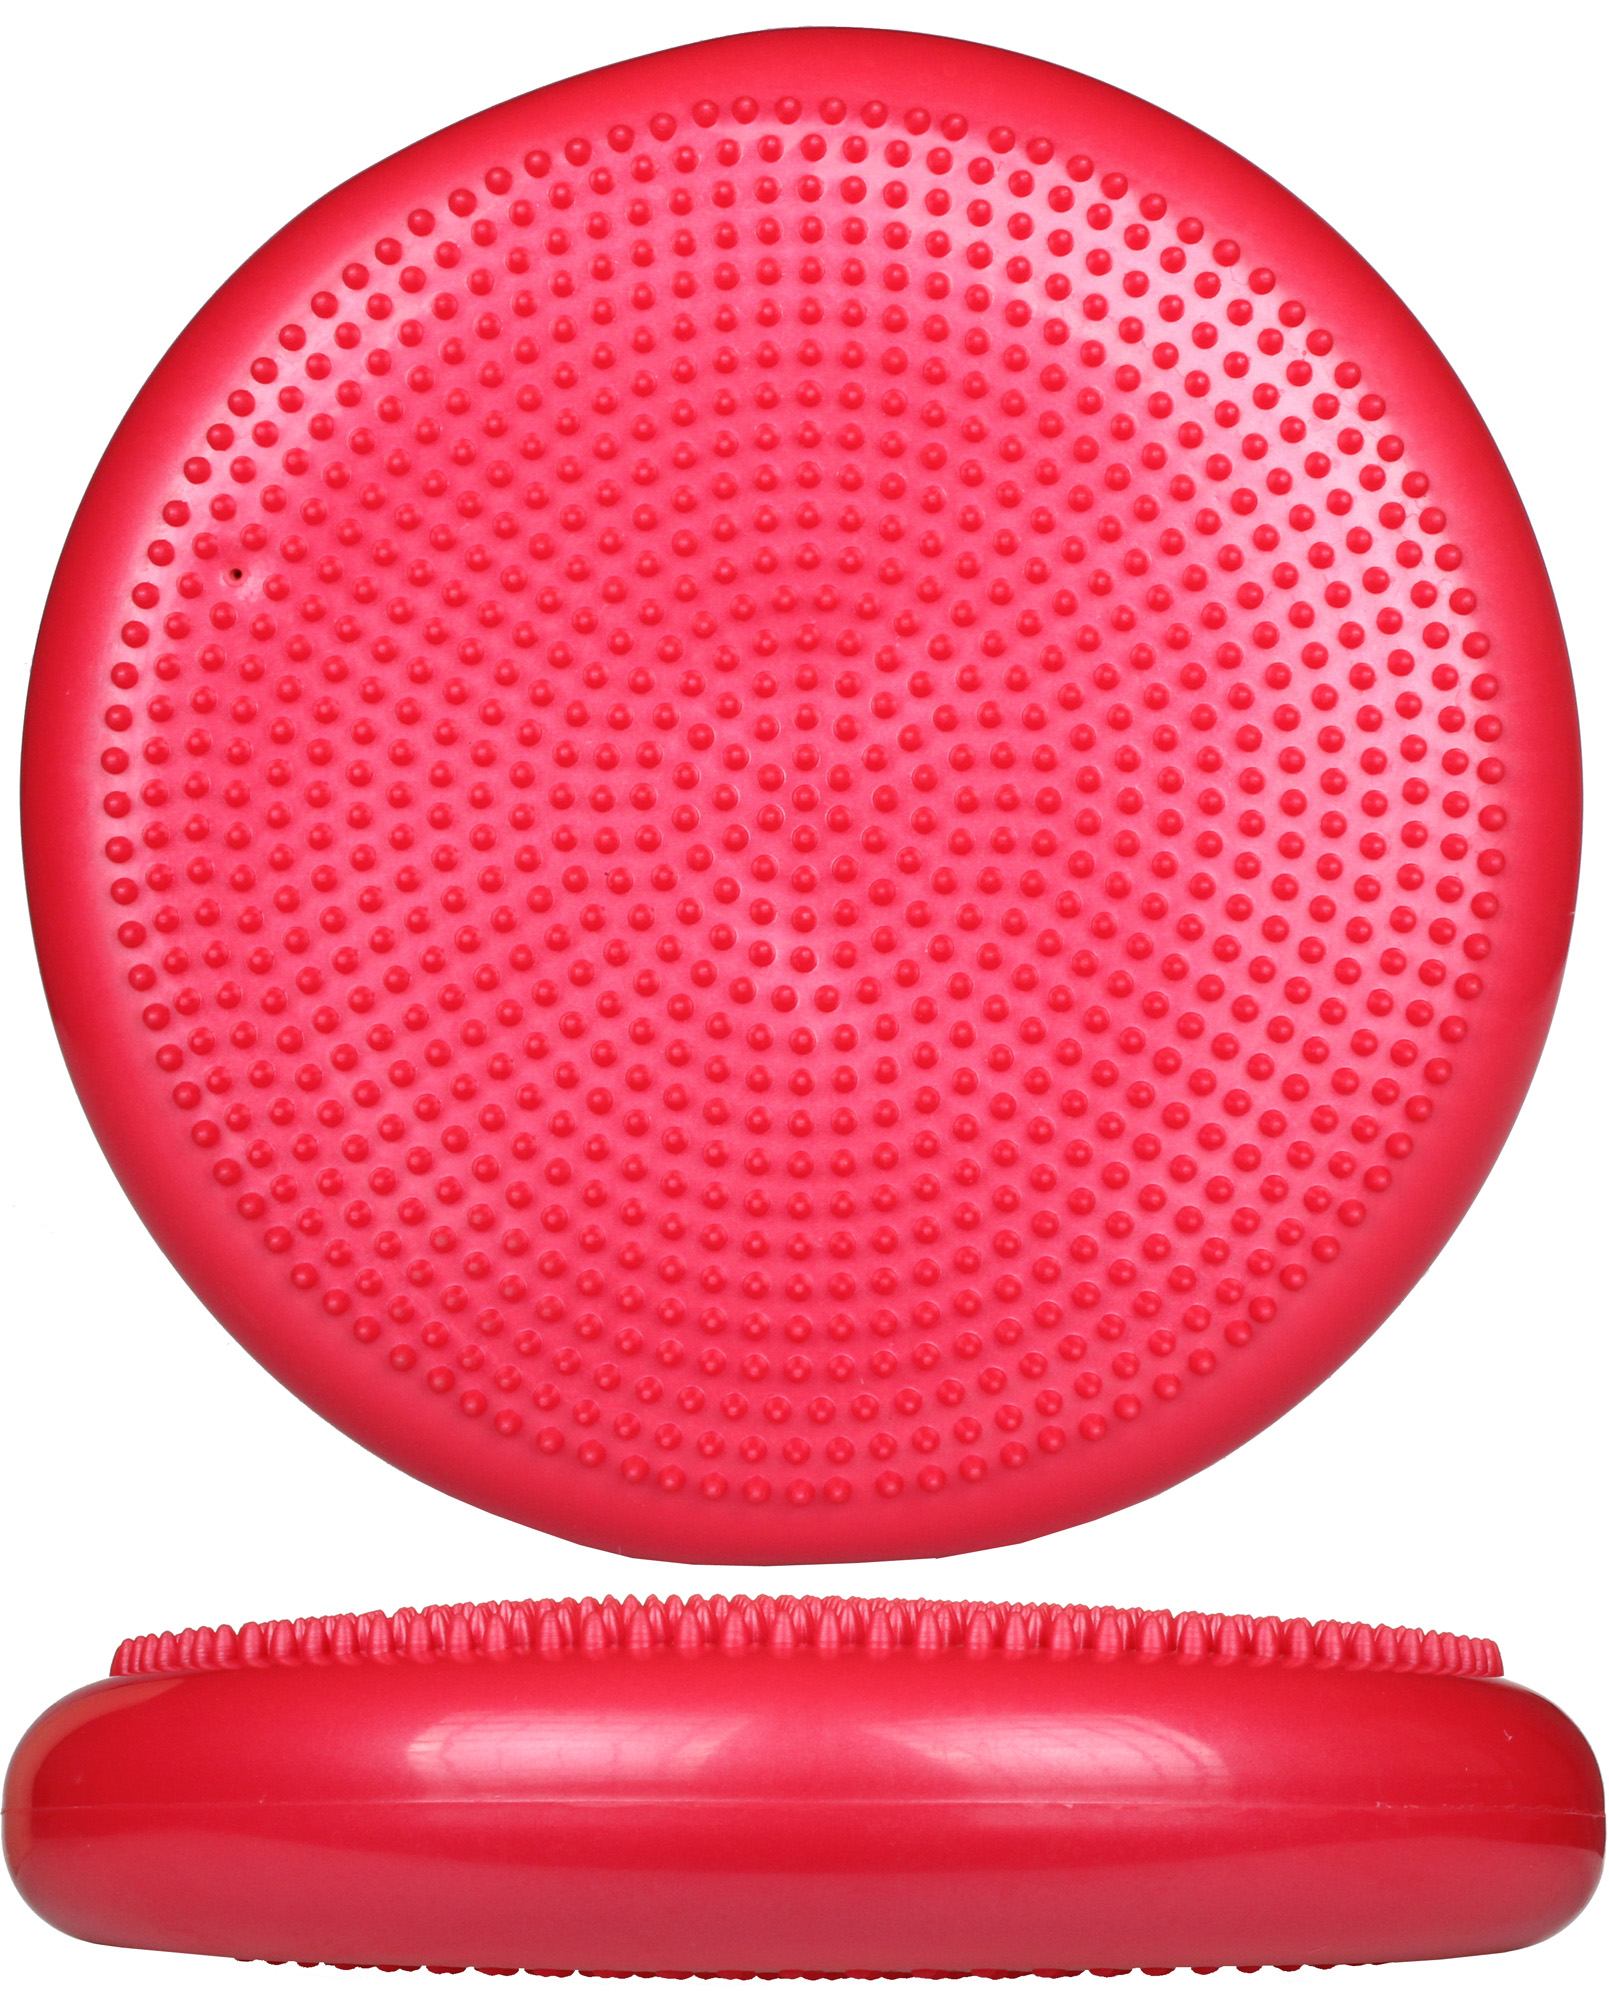 Merco Balanční podložka čočka Barva: Červená